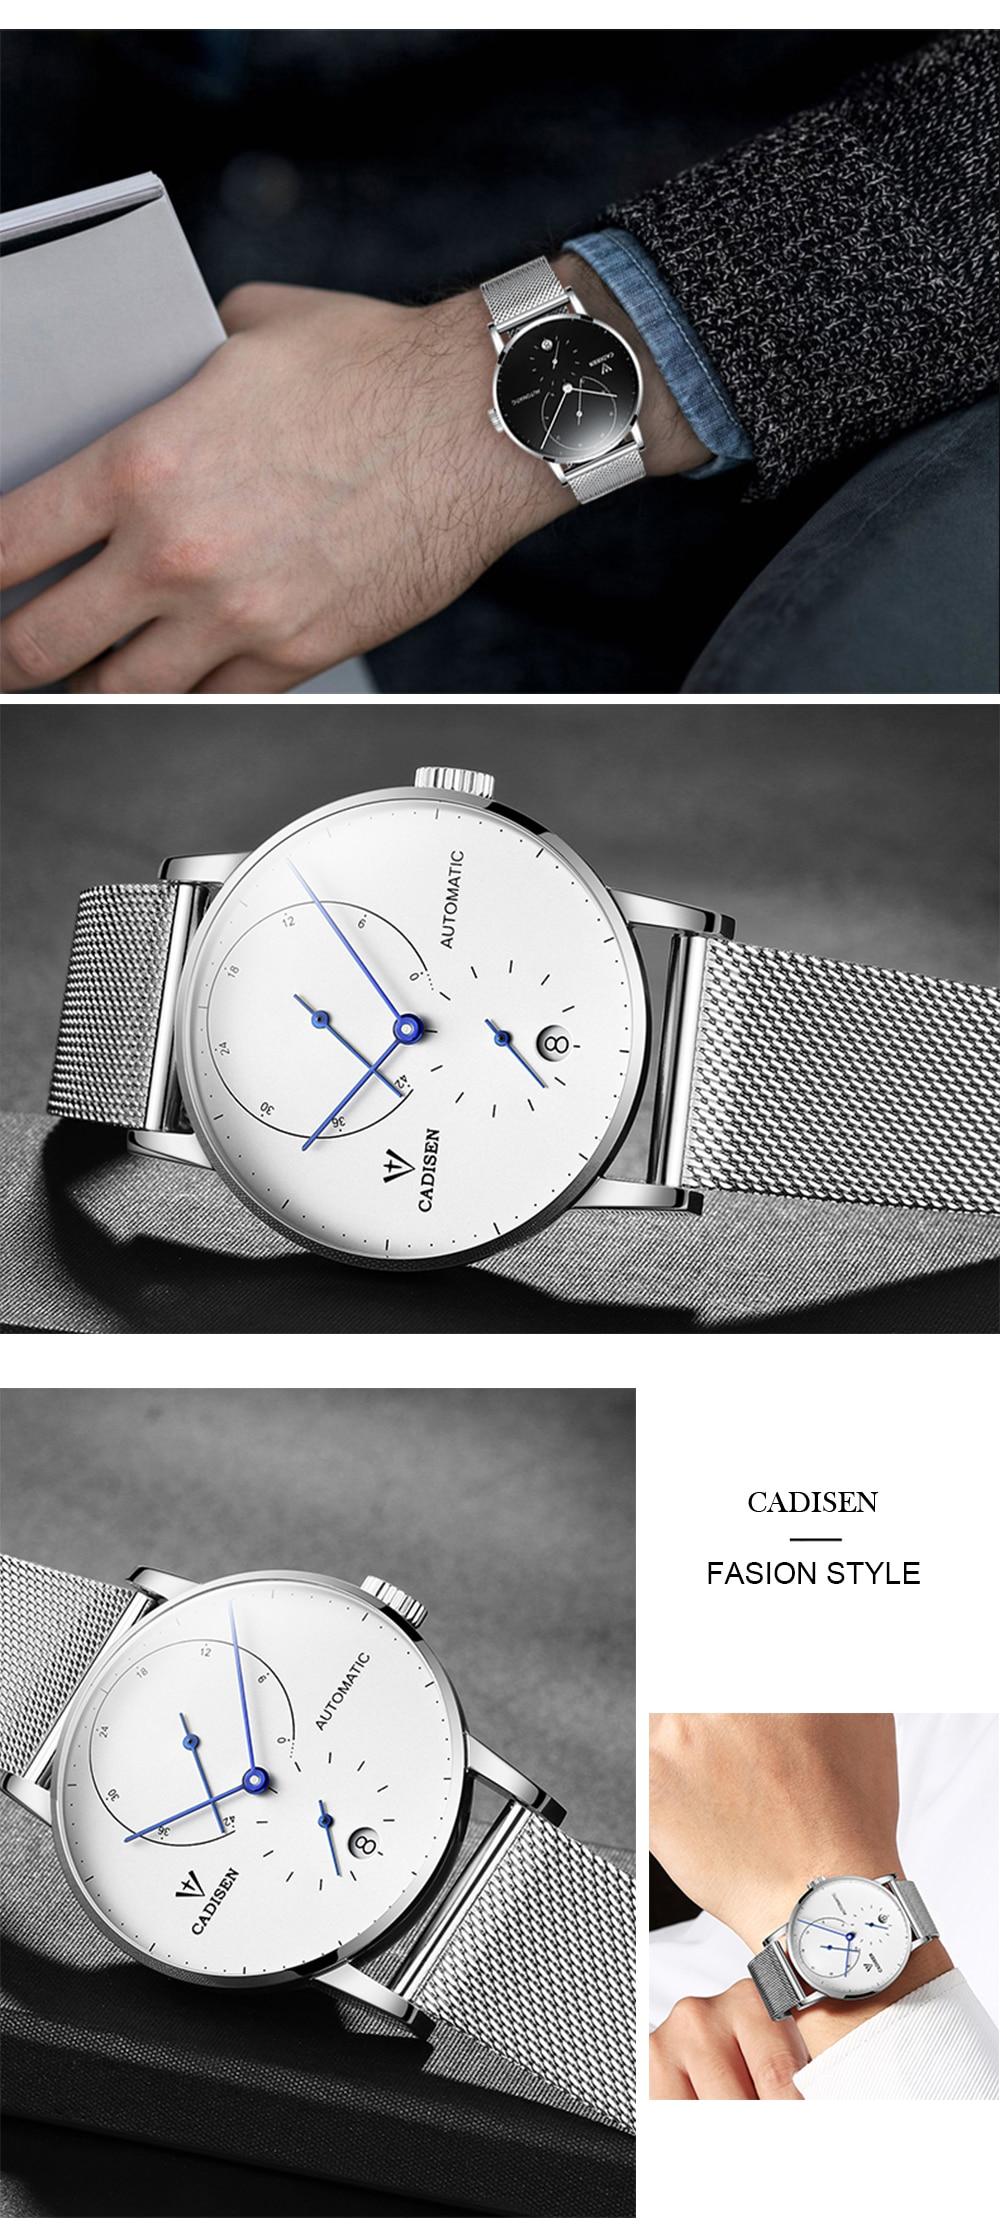 HTB1iAZdD1GSBuNjSspbq6AiipXaY CADISEN Top Mens Watches Top Brand Luxury Automatic Mechanical Watch Men Full Steel Business Waterproof Fashion Sport Watches